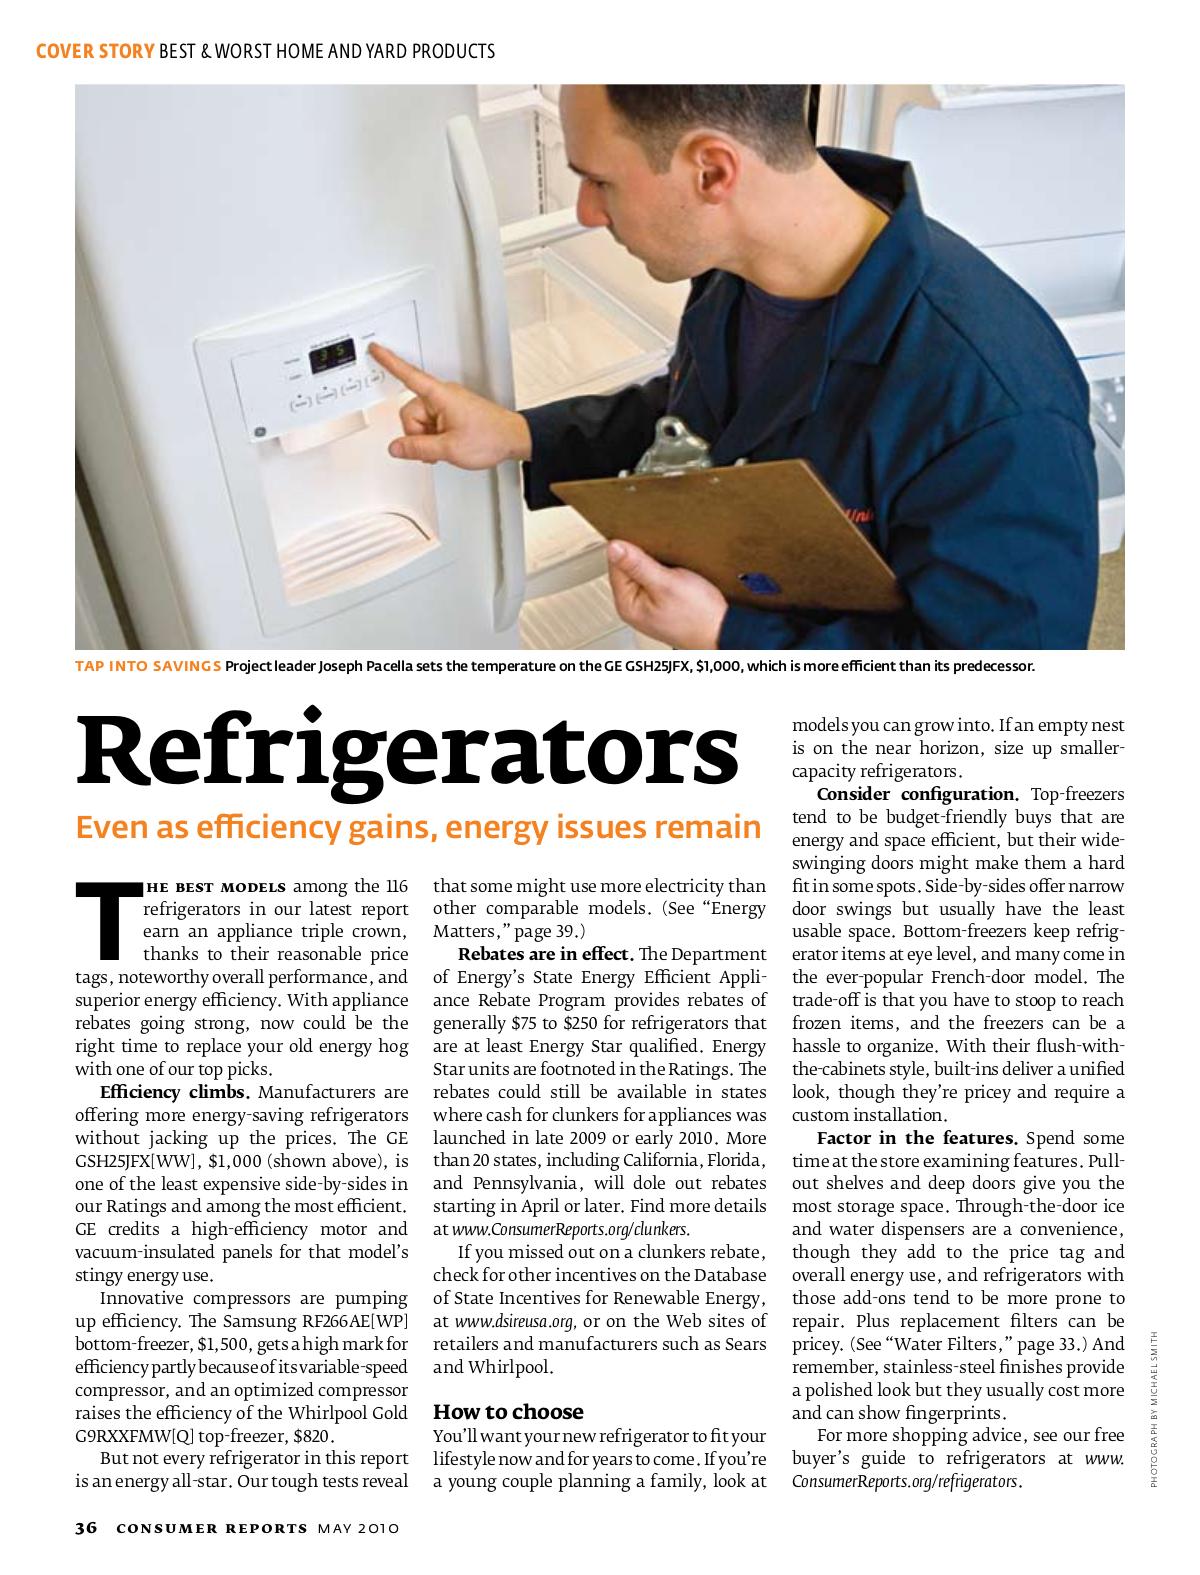 pdf for Samsung Refrigerator RF266AE manual